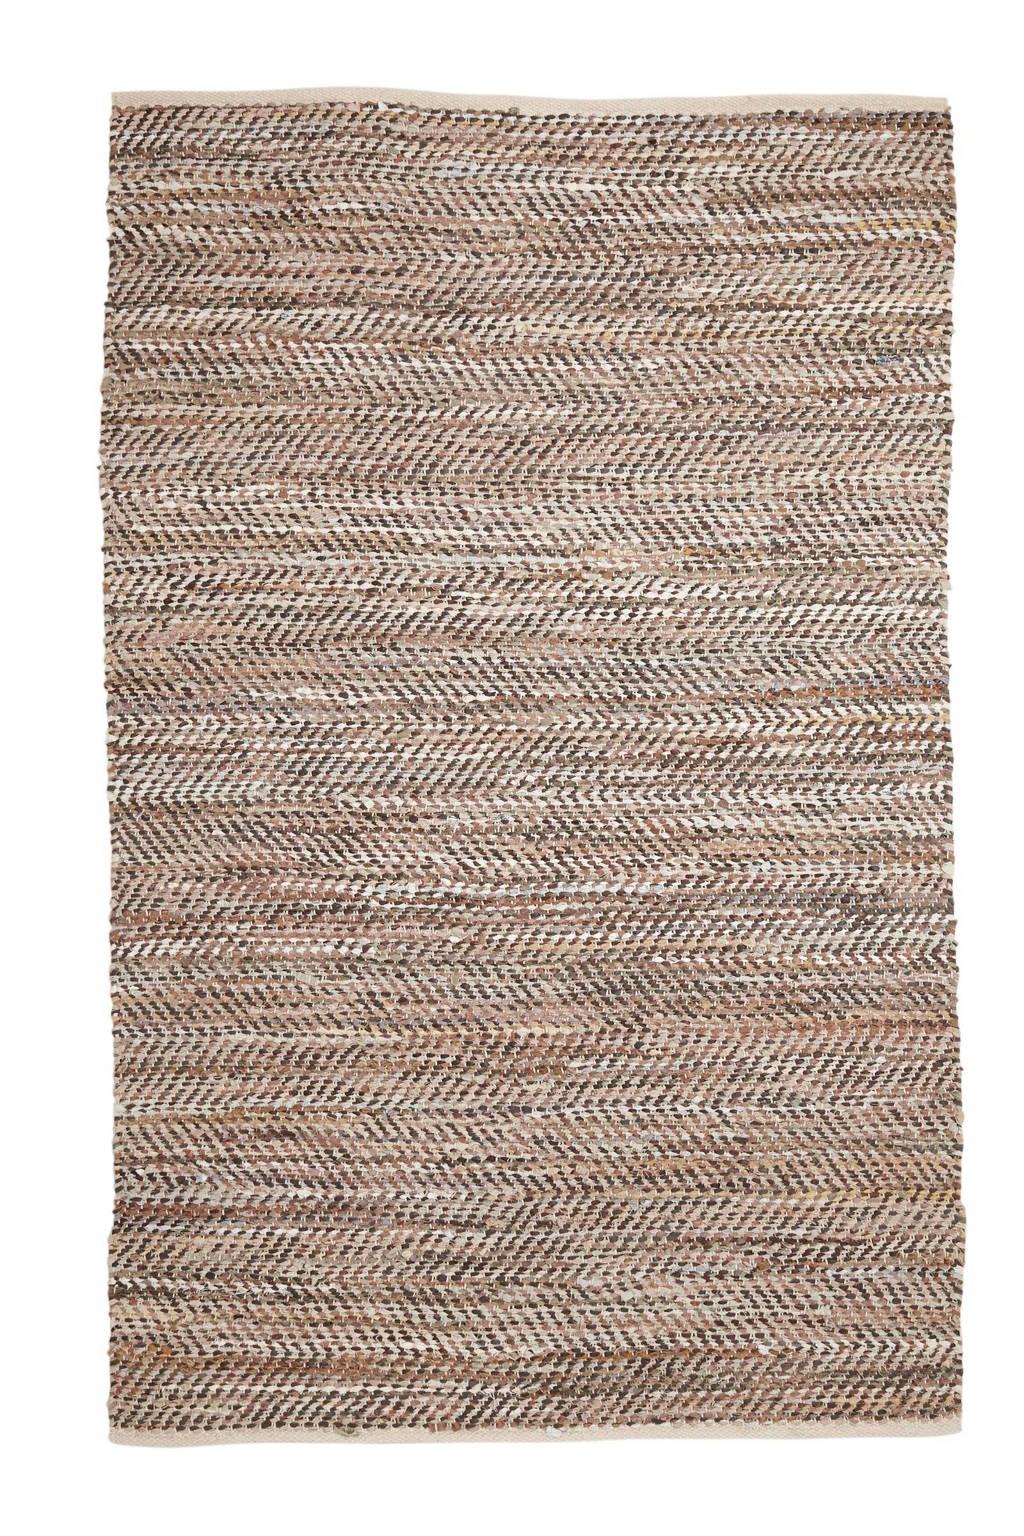 whkmp's own vloerkleed (leer)  (230x160 cm), Bruin/beige